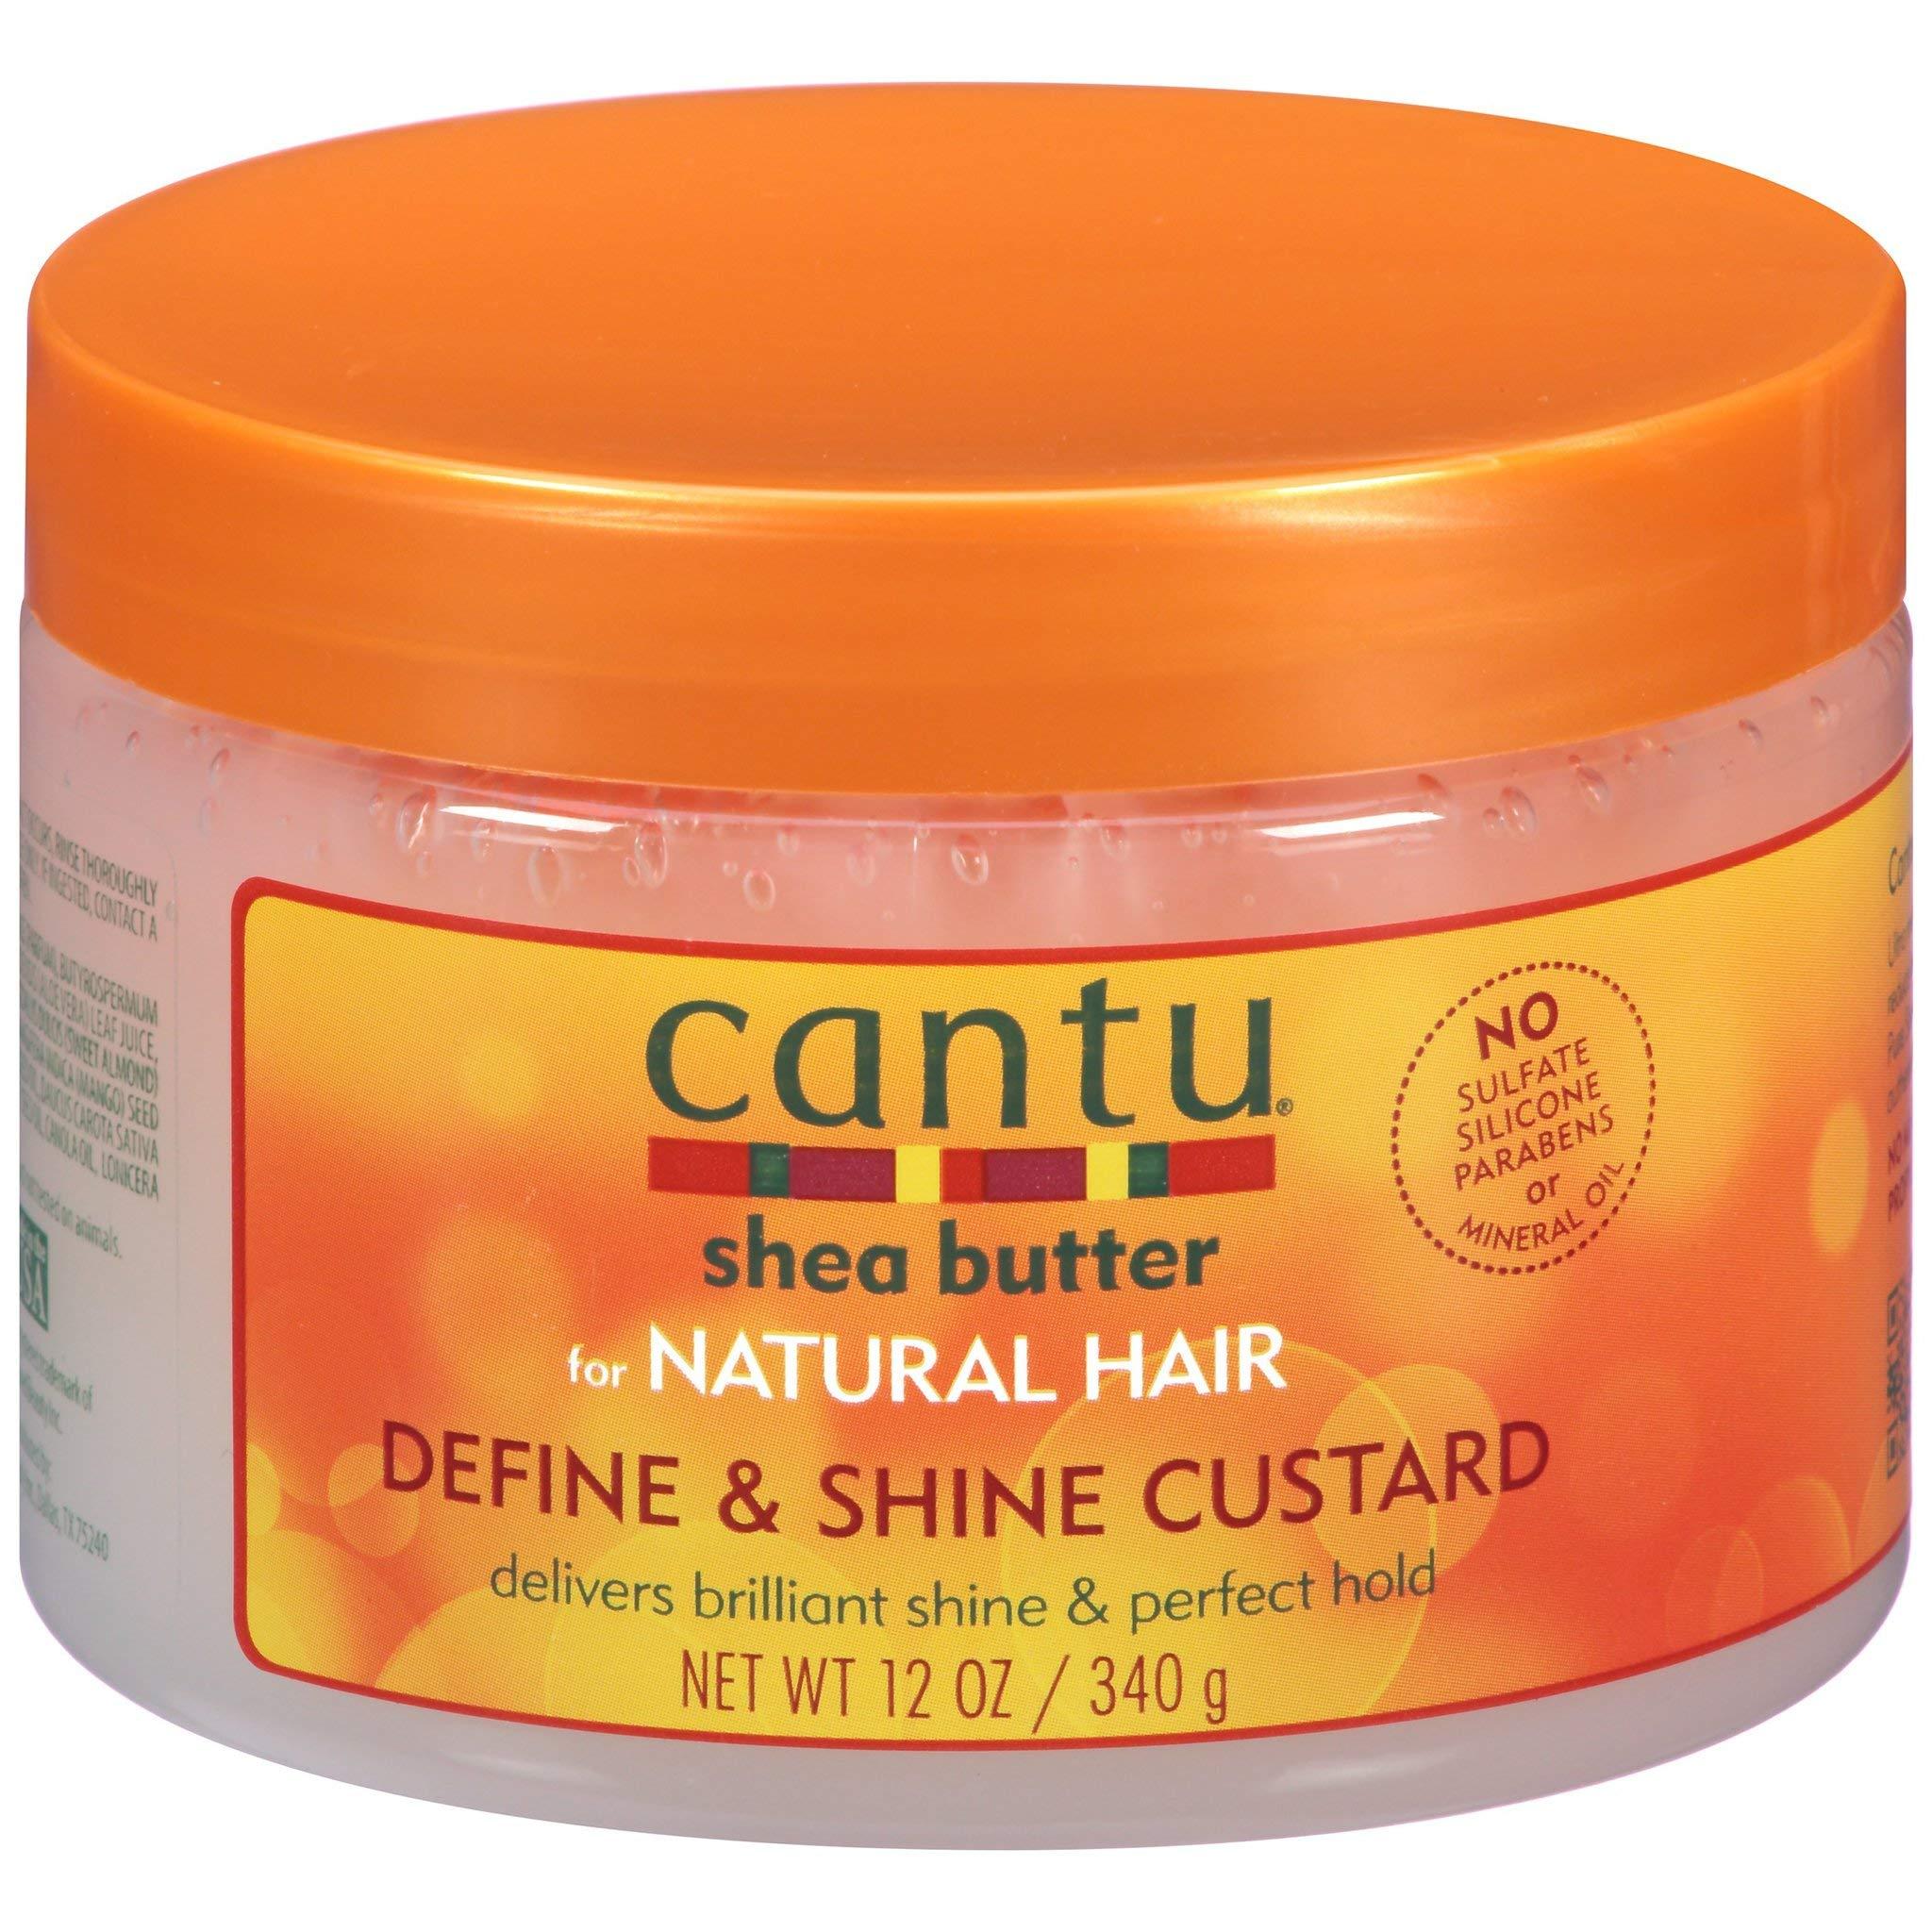 Shea Butter for Natural Hair Curling Custard, 12 Ounce